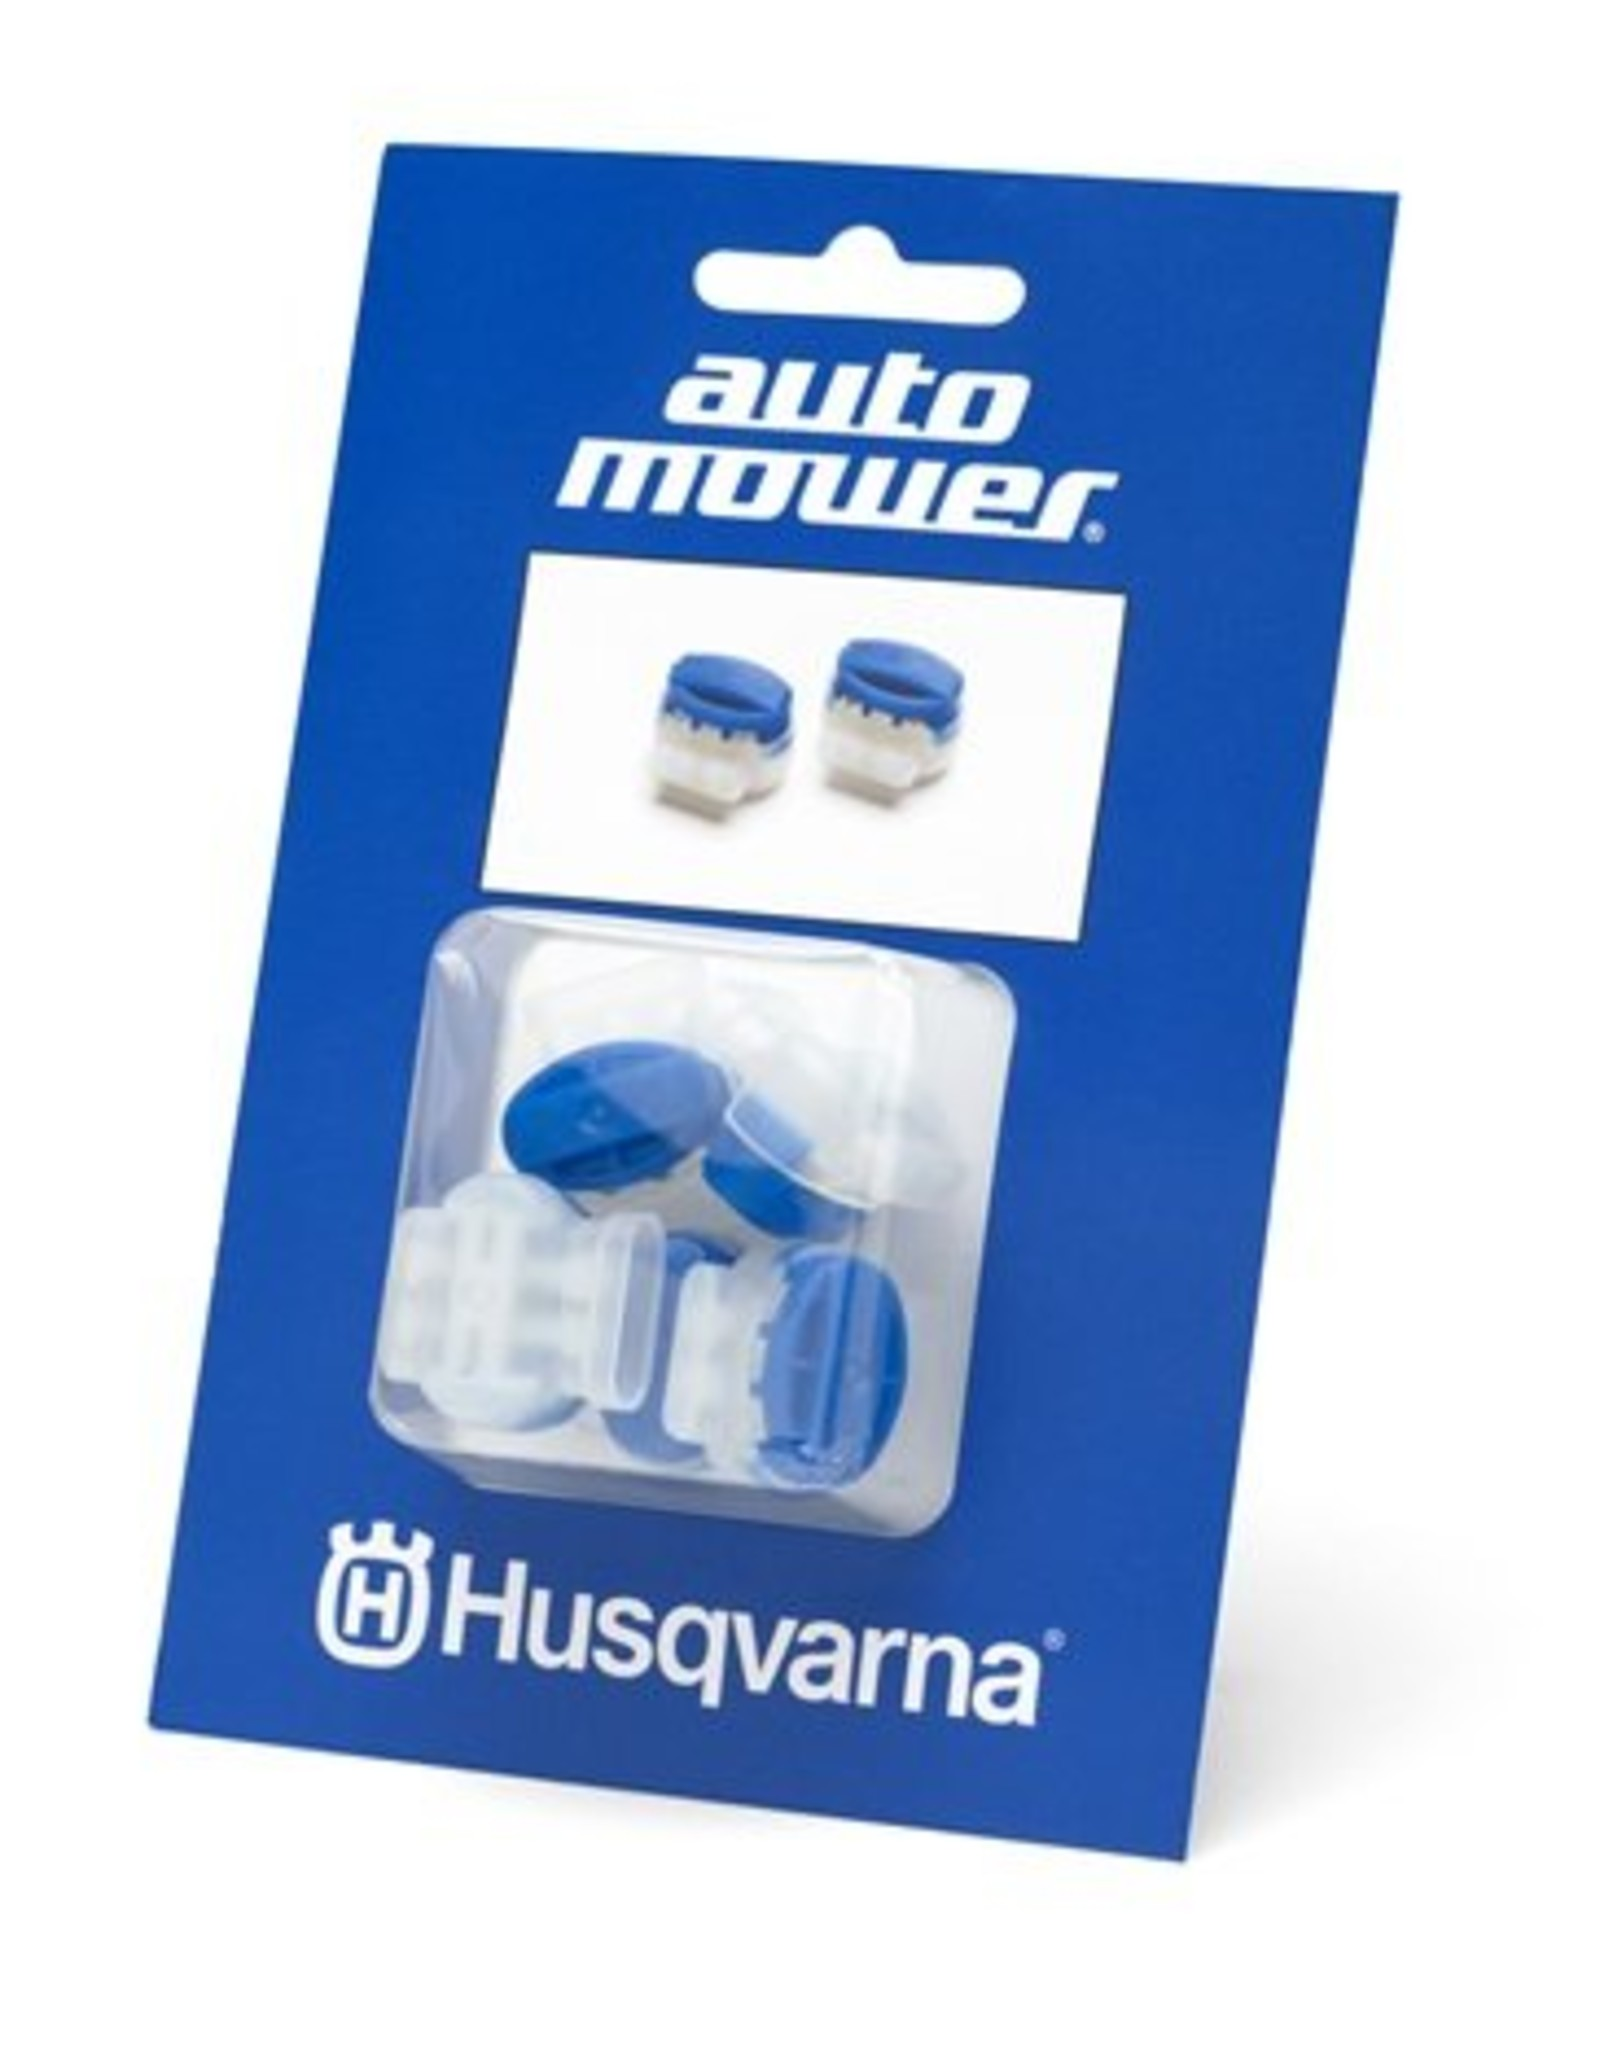 Husqvarna Husqvarna Automower® Verbinders (5x)